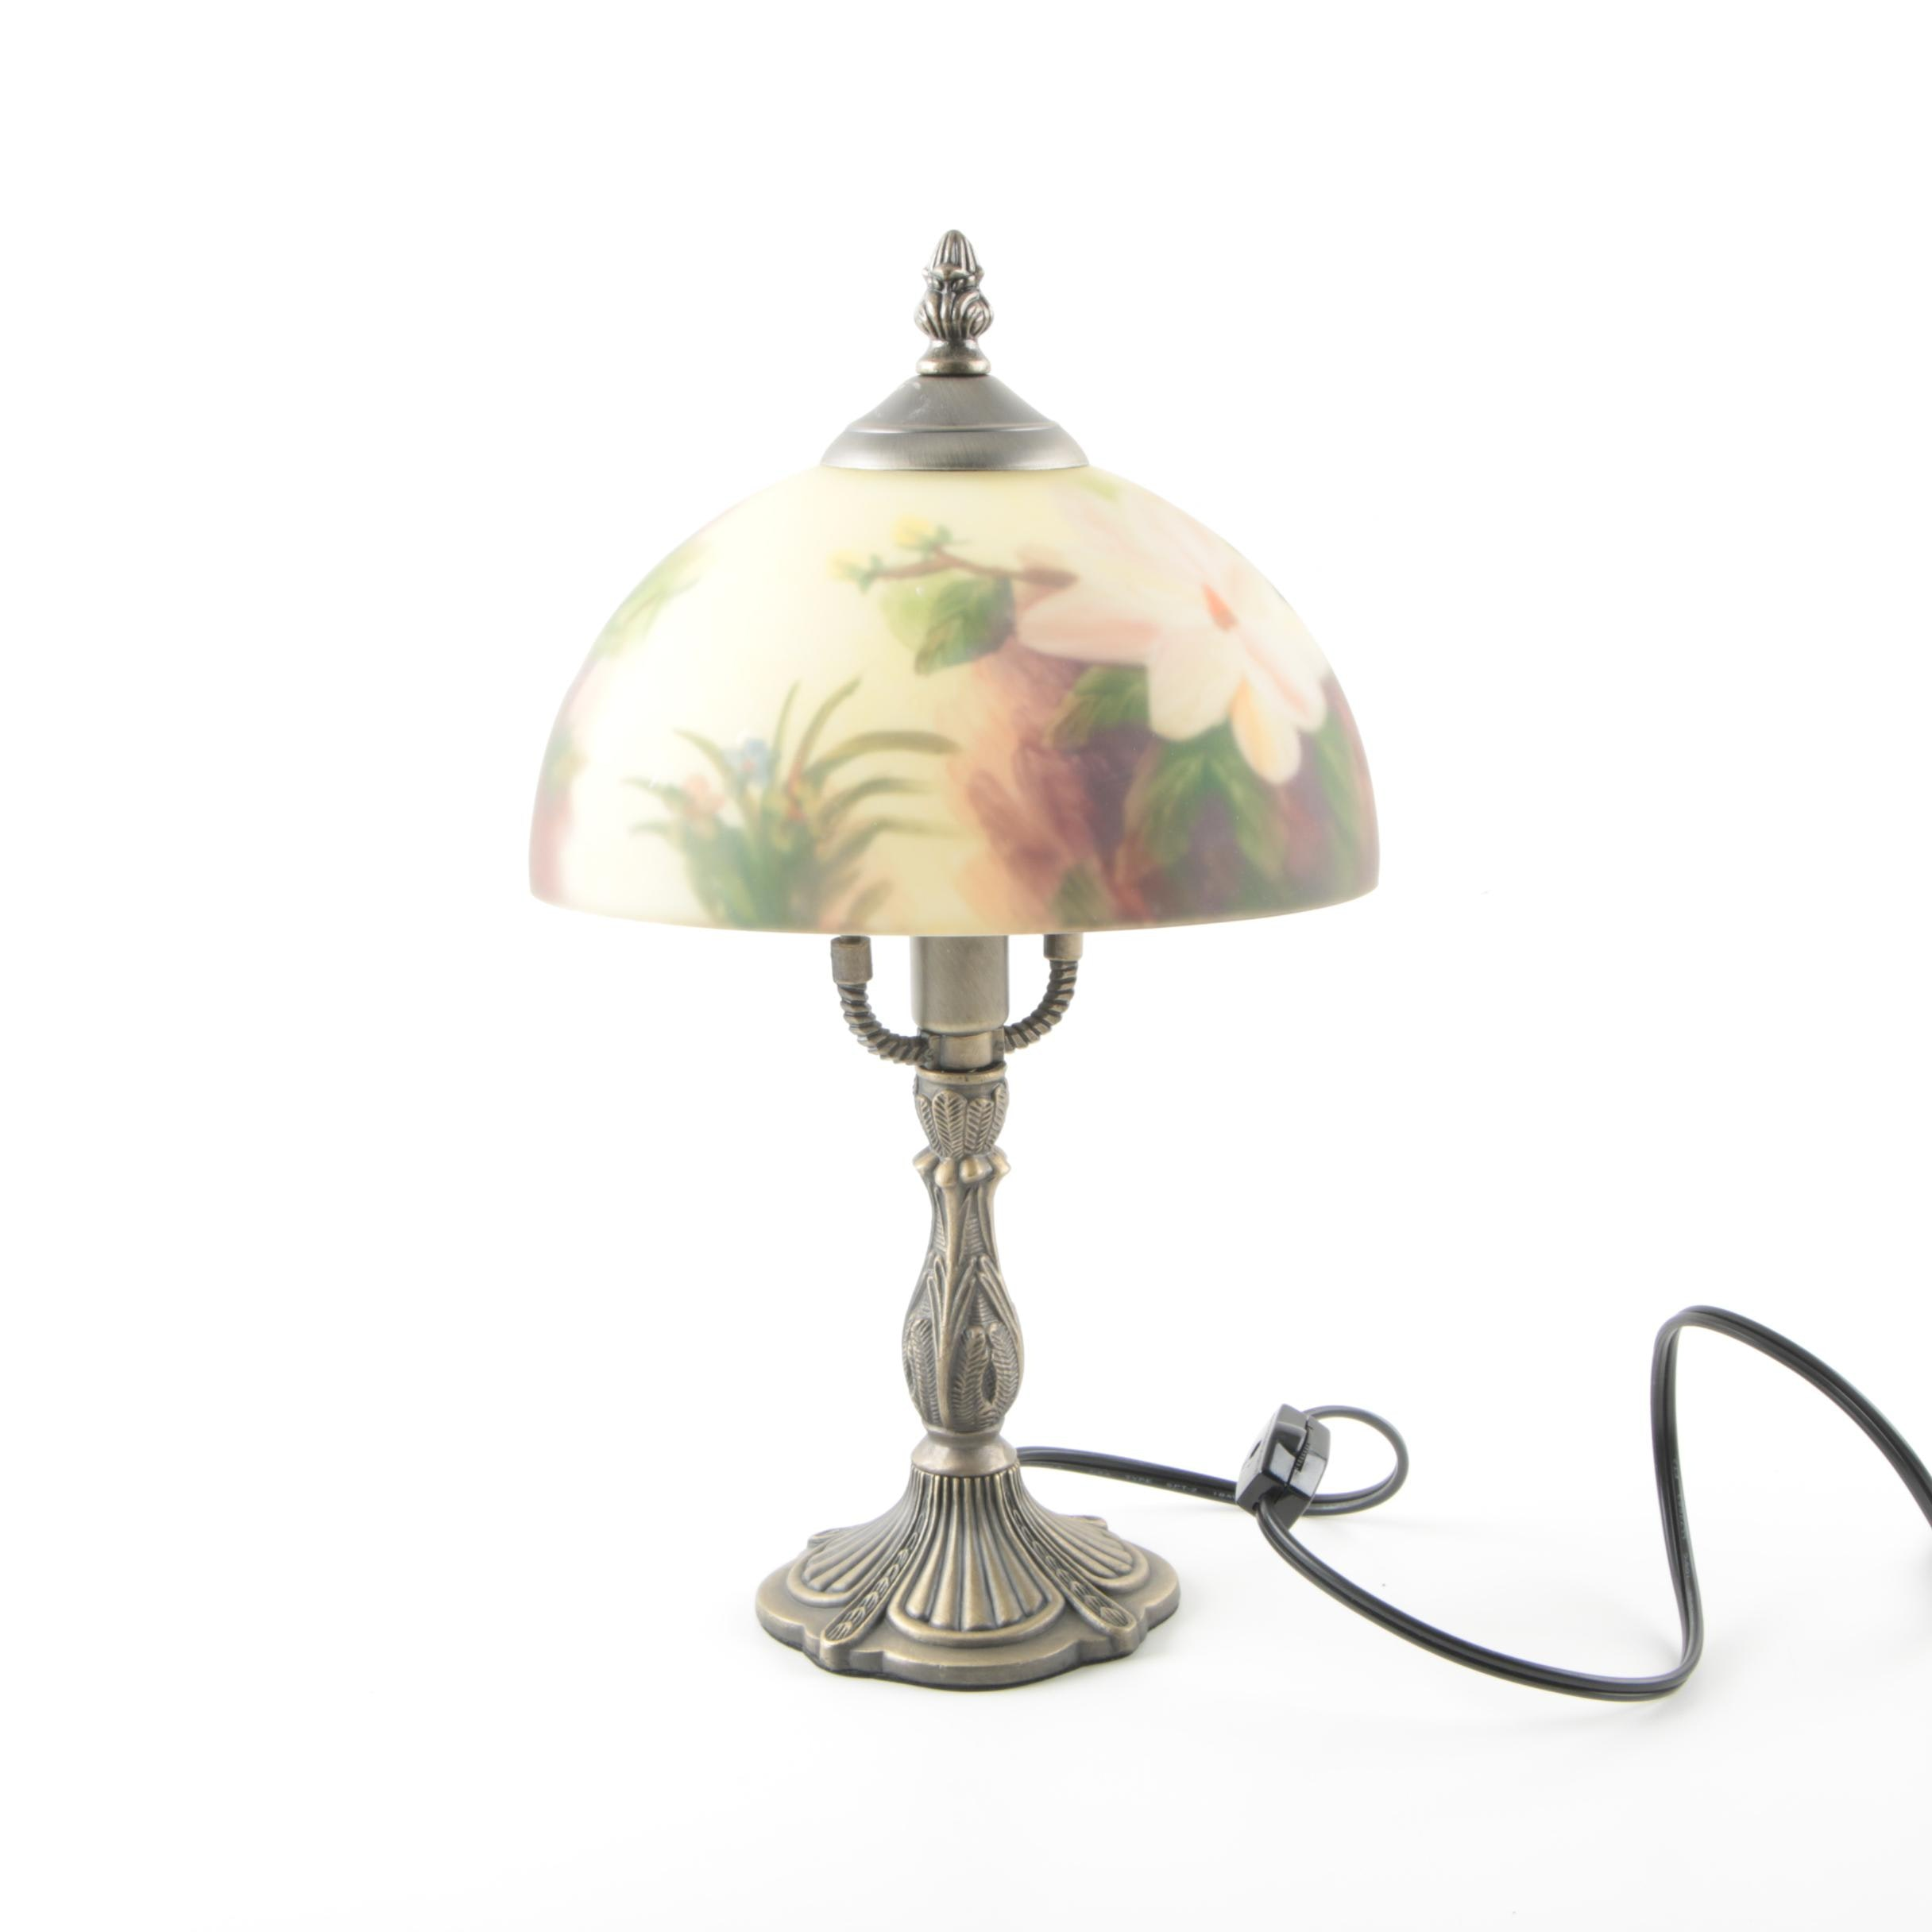 Art Deco Style Desk Lamp